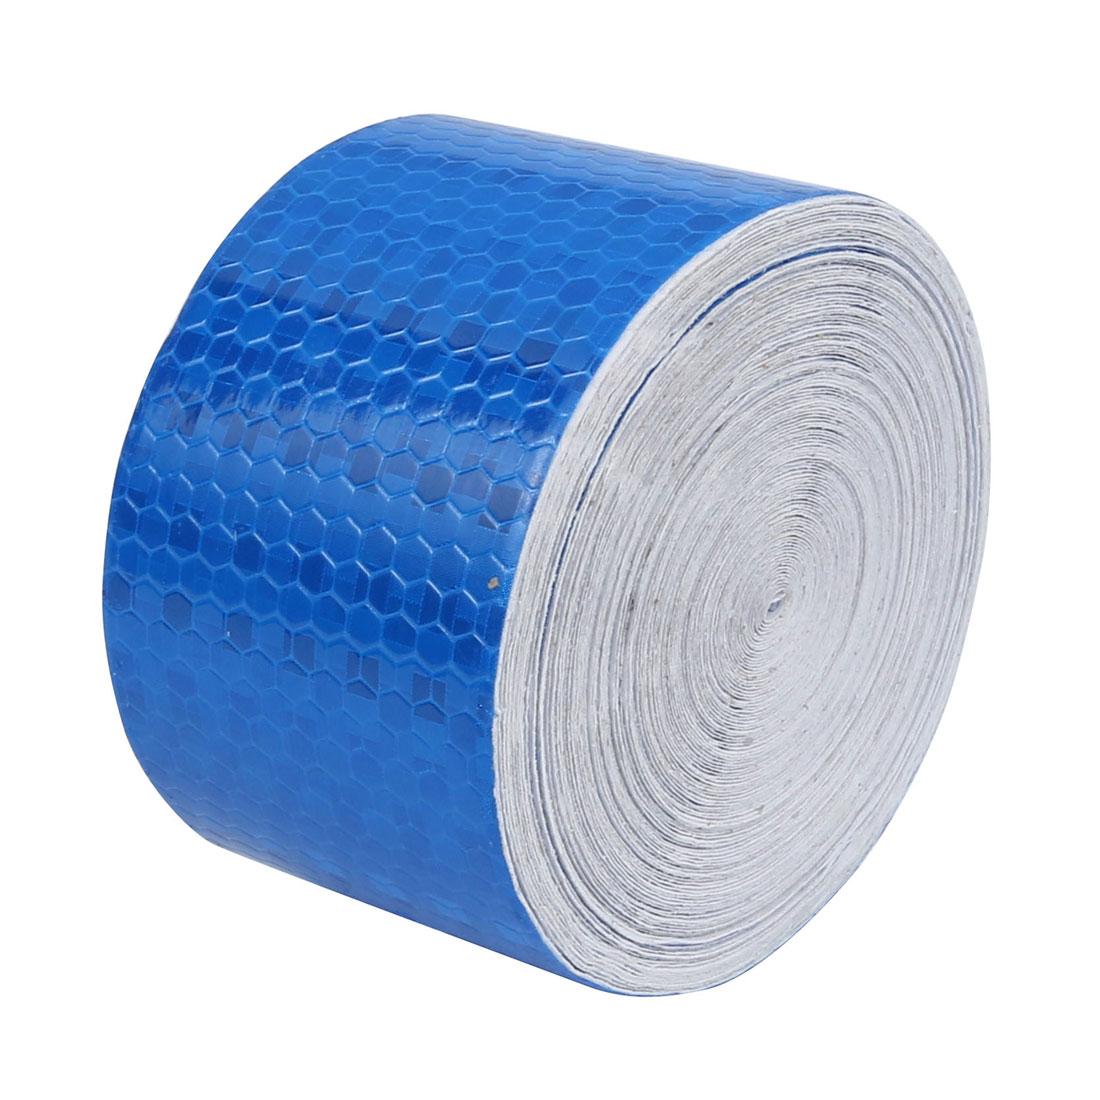 5cm Width 15M Length Single Sided Adhesive Reflective Warning Tape Blue